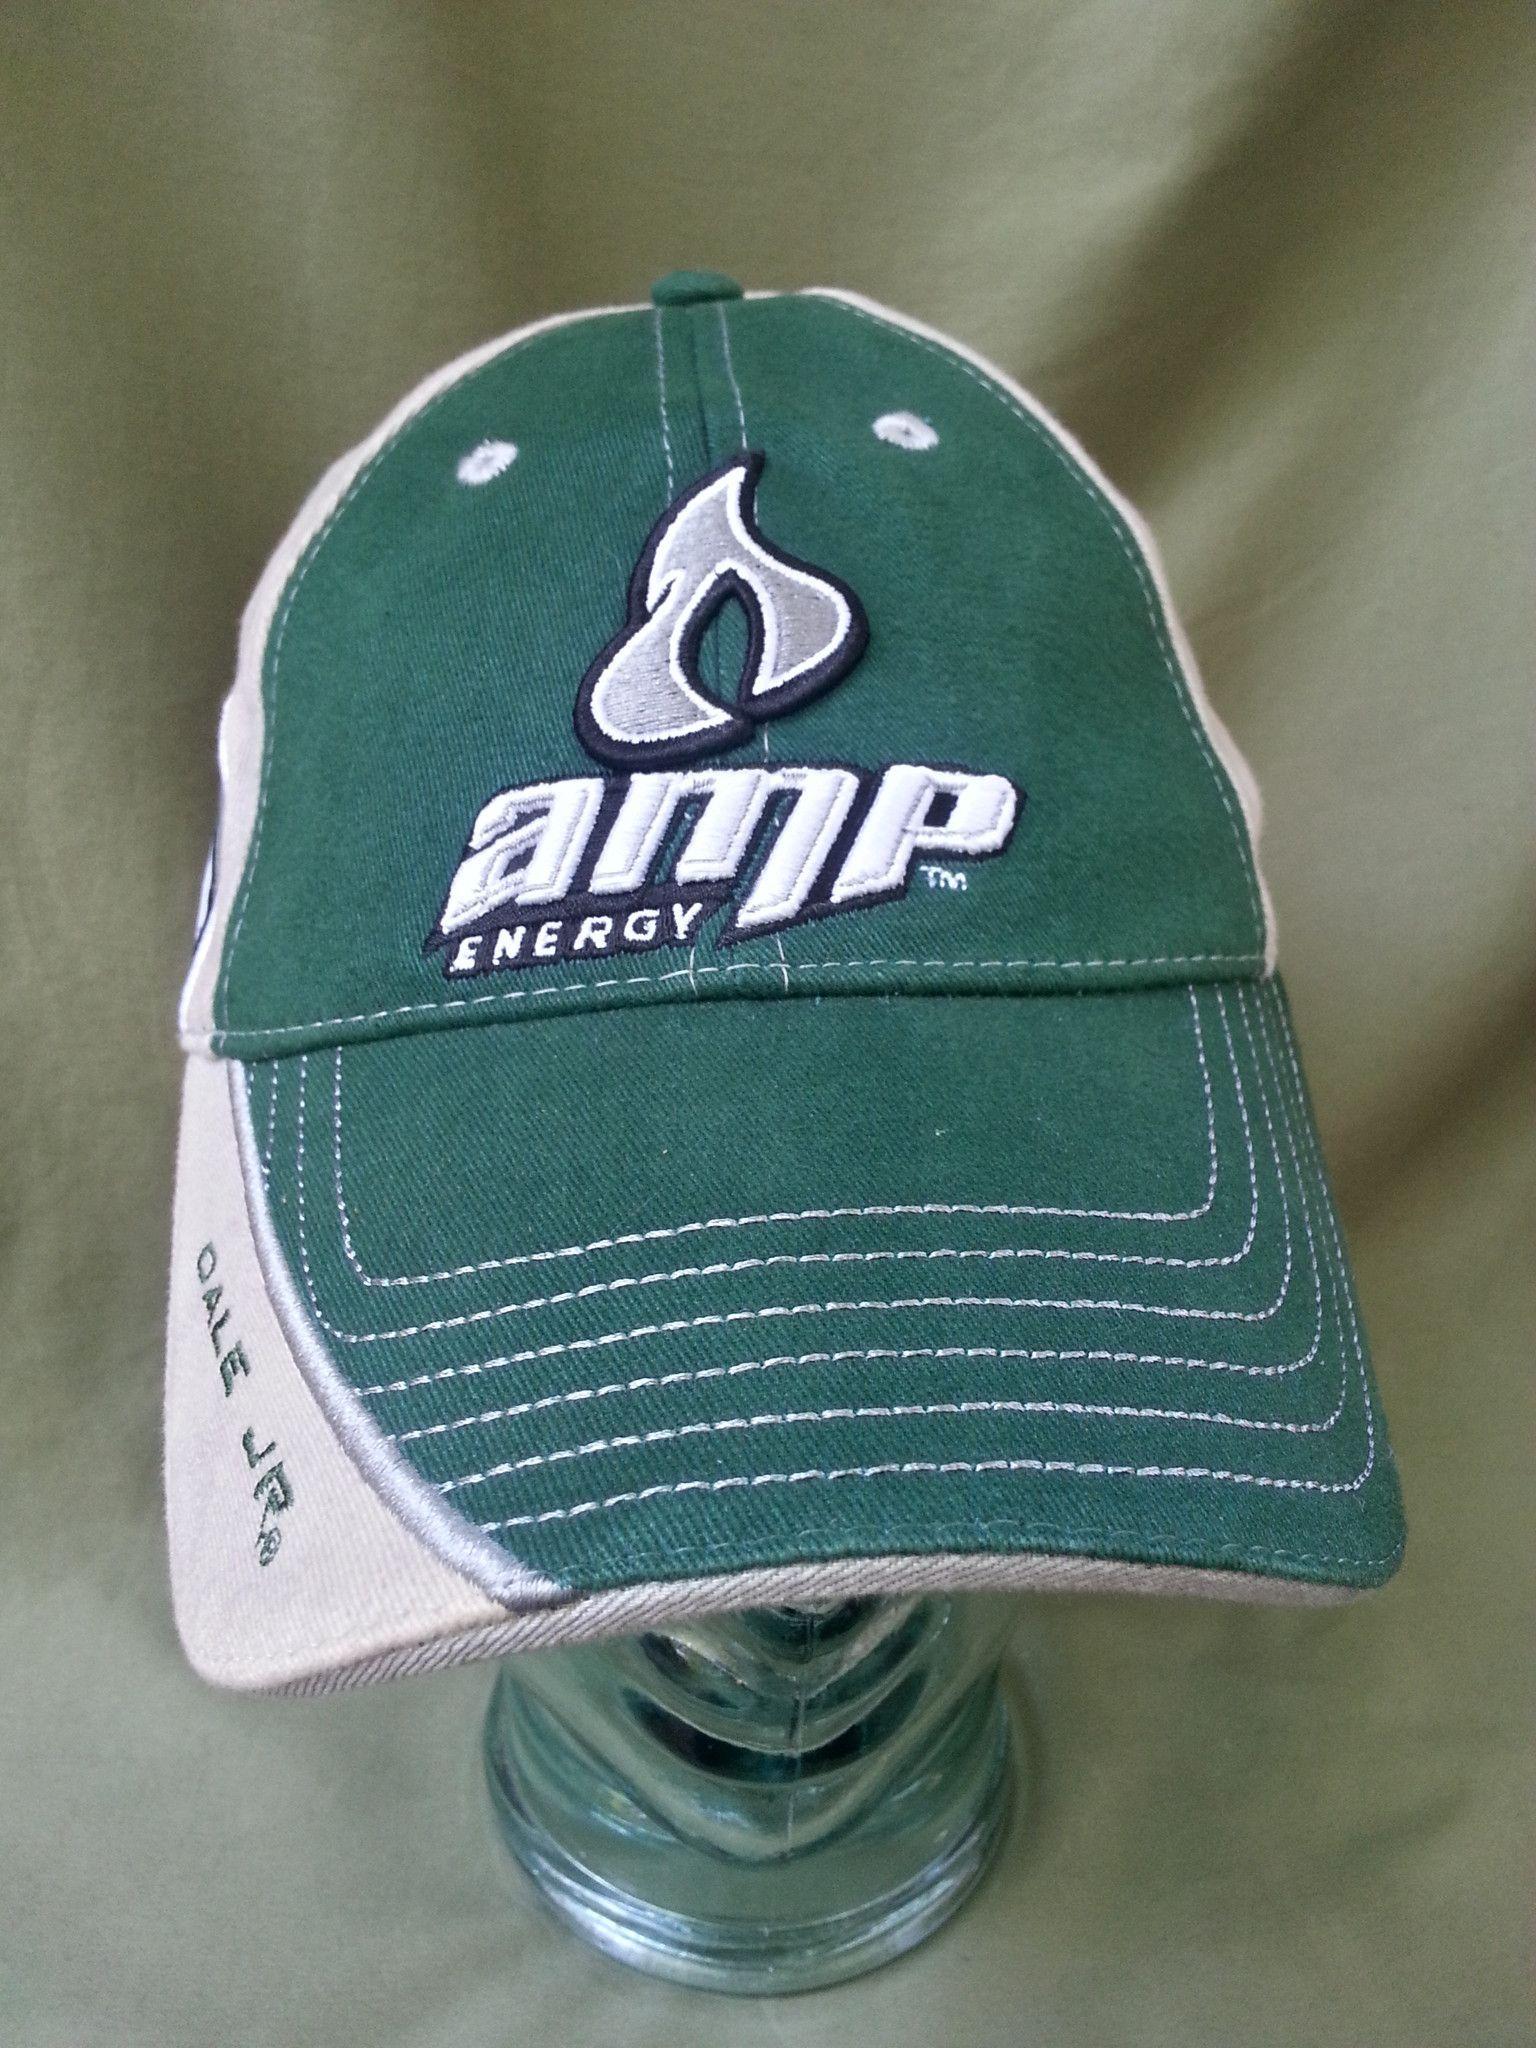 Dale Earnhardt Jr Amp Energy Drink Flex Fit Hat by Chase Authentics